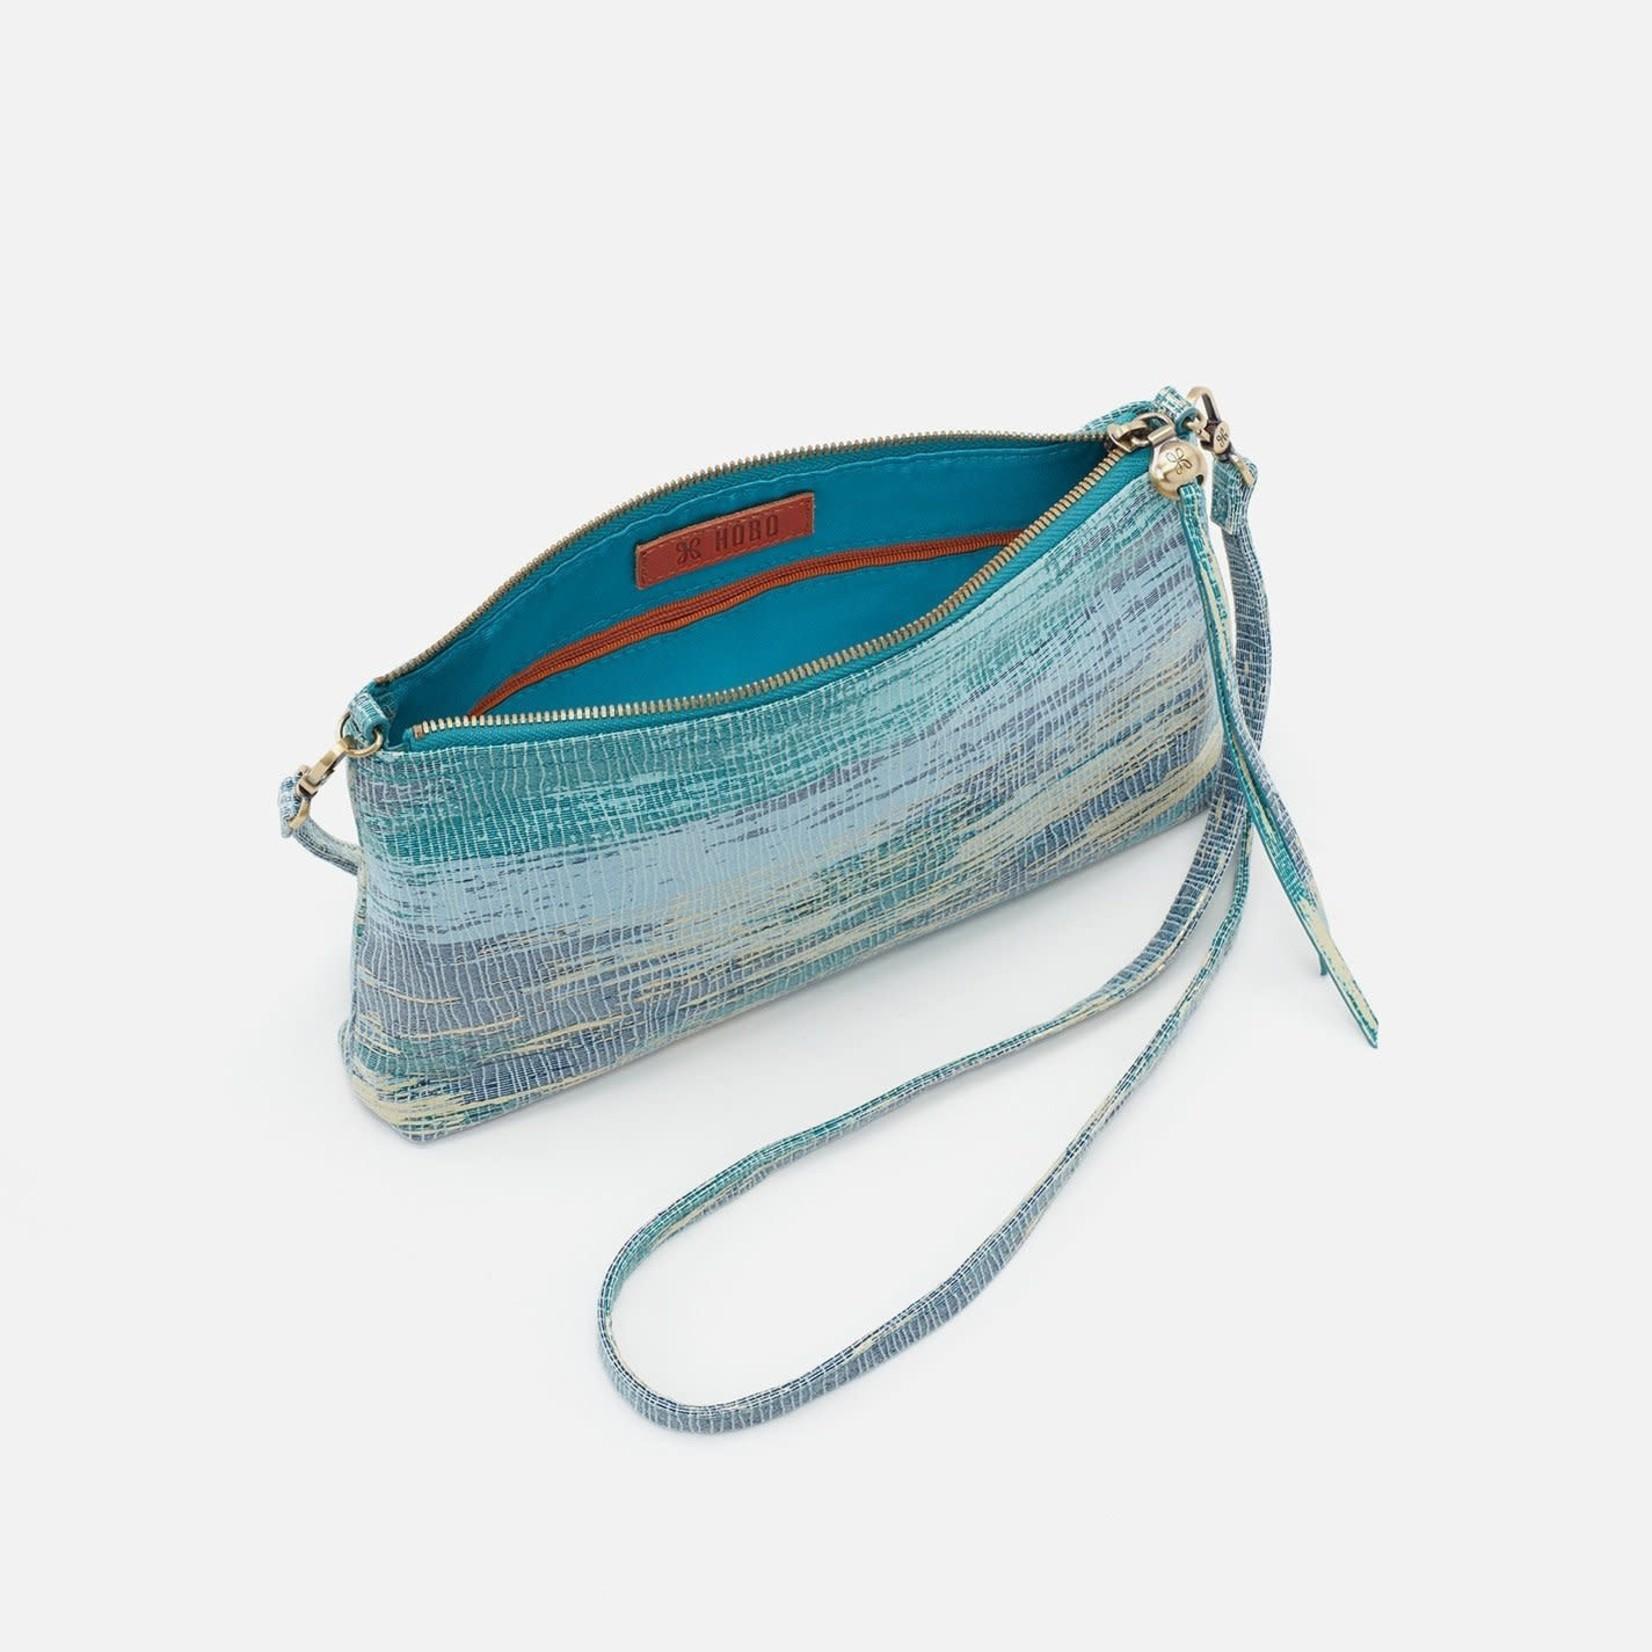 HOBO Darcy Cracked Glass Vintage Hide Leather Wristlet/Crossbody